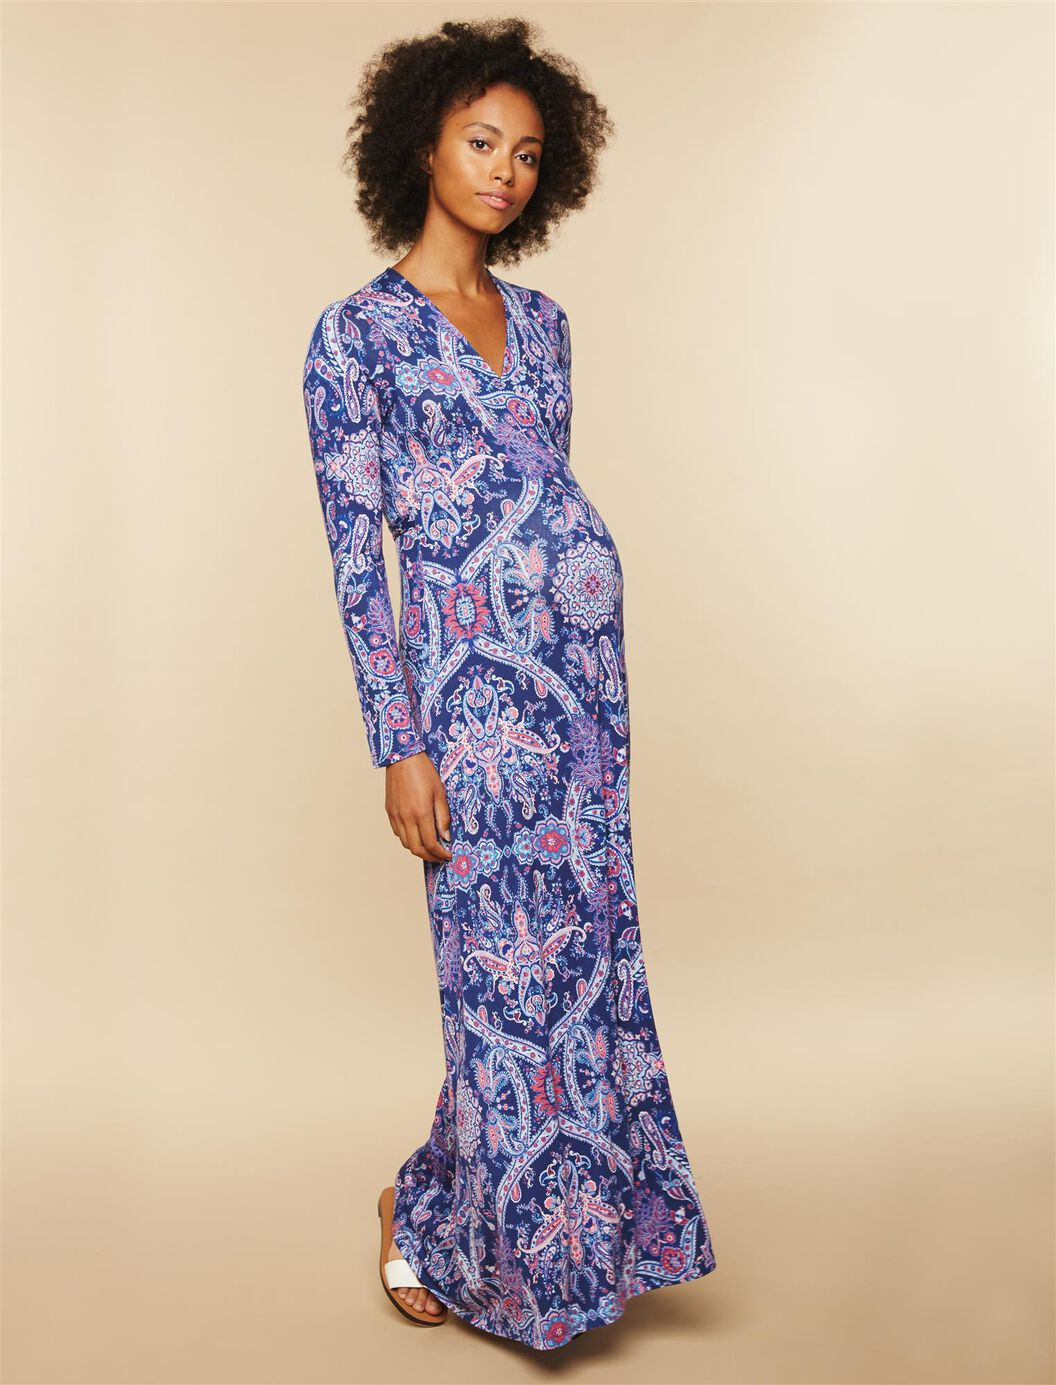 Printed Wrap Maternity Maxi Dress at Motherhood Maternity in Victor, NY | Tuggl